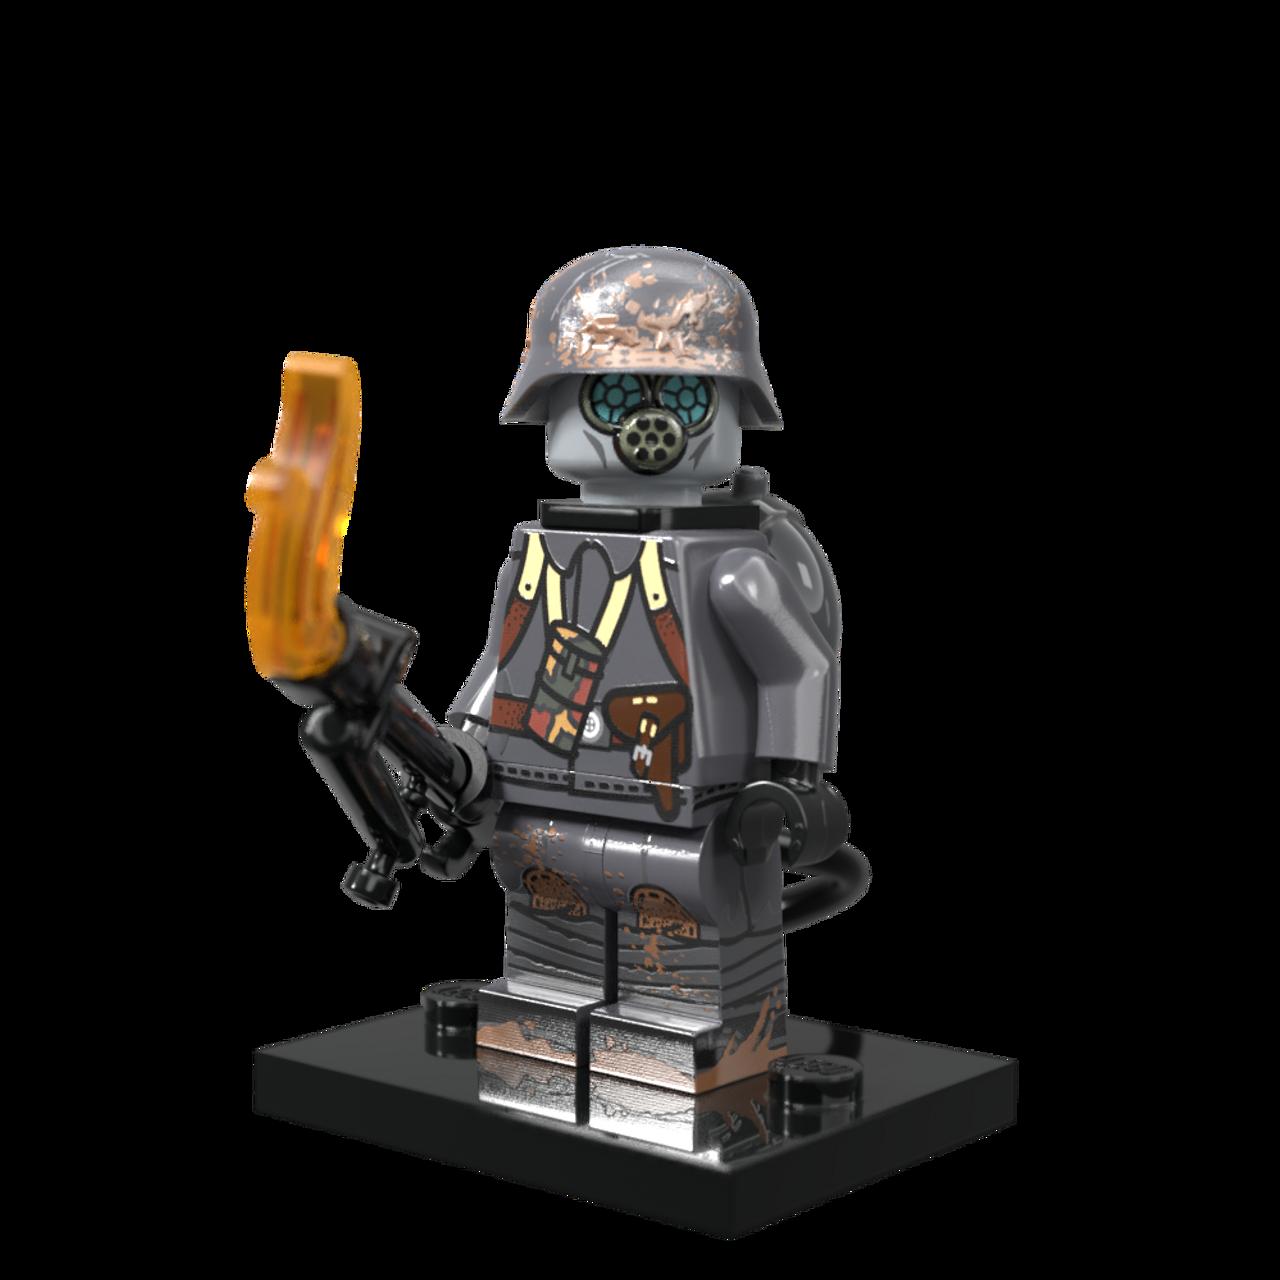 Lego Custom USA FLAMETROOPER Minifigure WWII Soldier W// Accessories